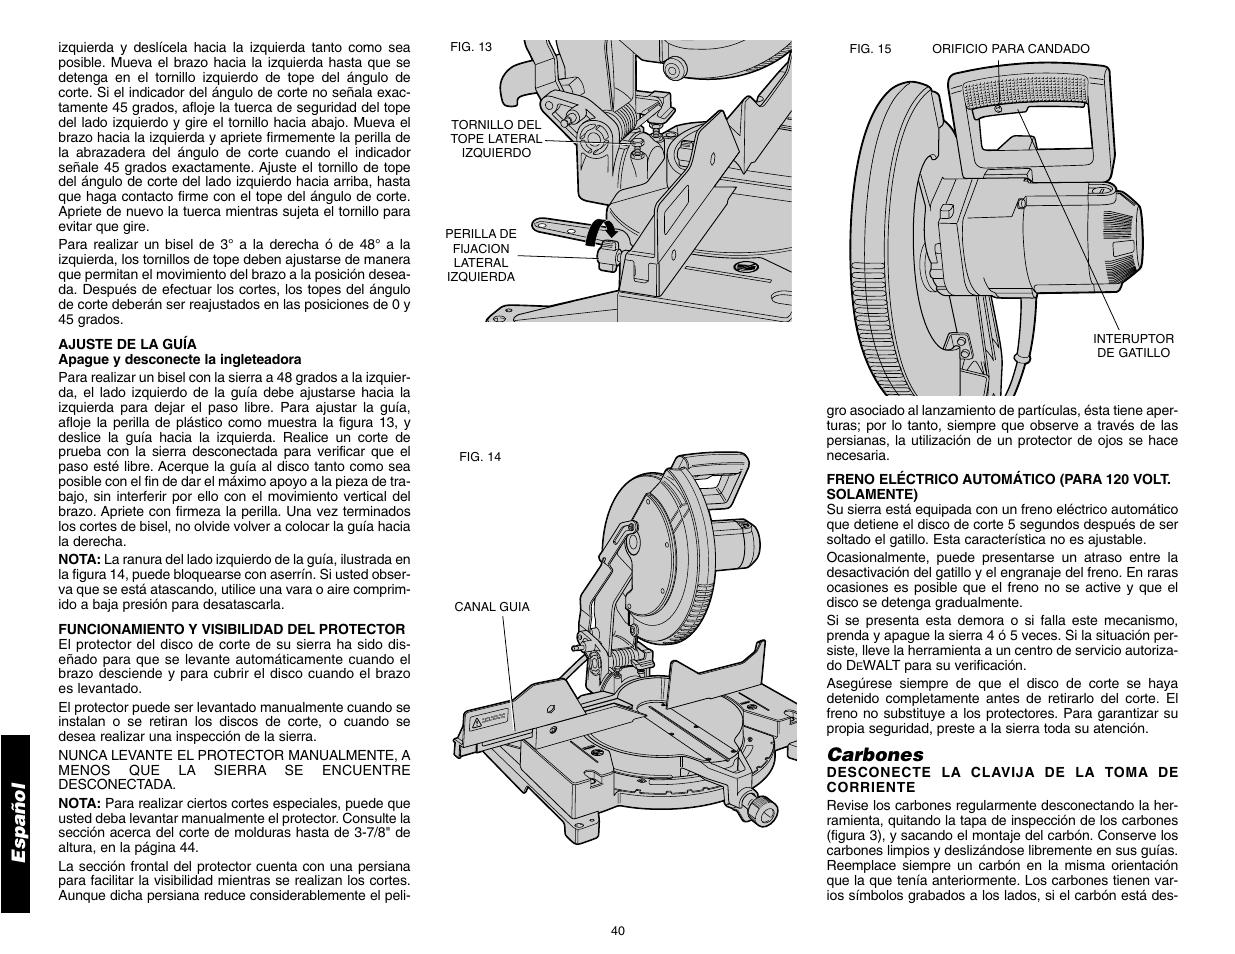 "DeWalt 12"" COMPOUND MITER SAW DW705 User Manual | Page 42 / 52"